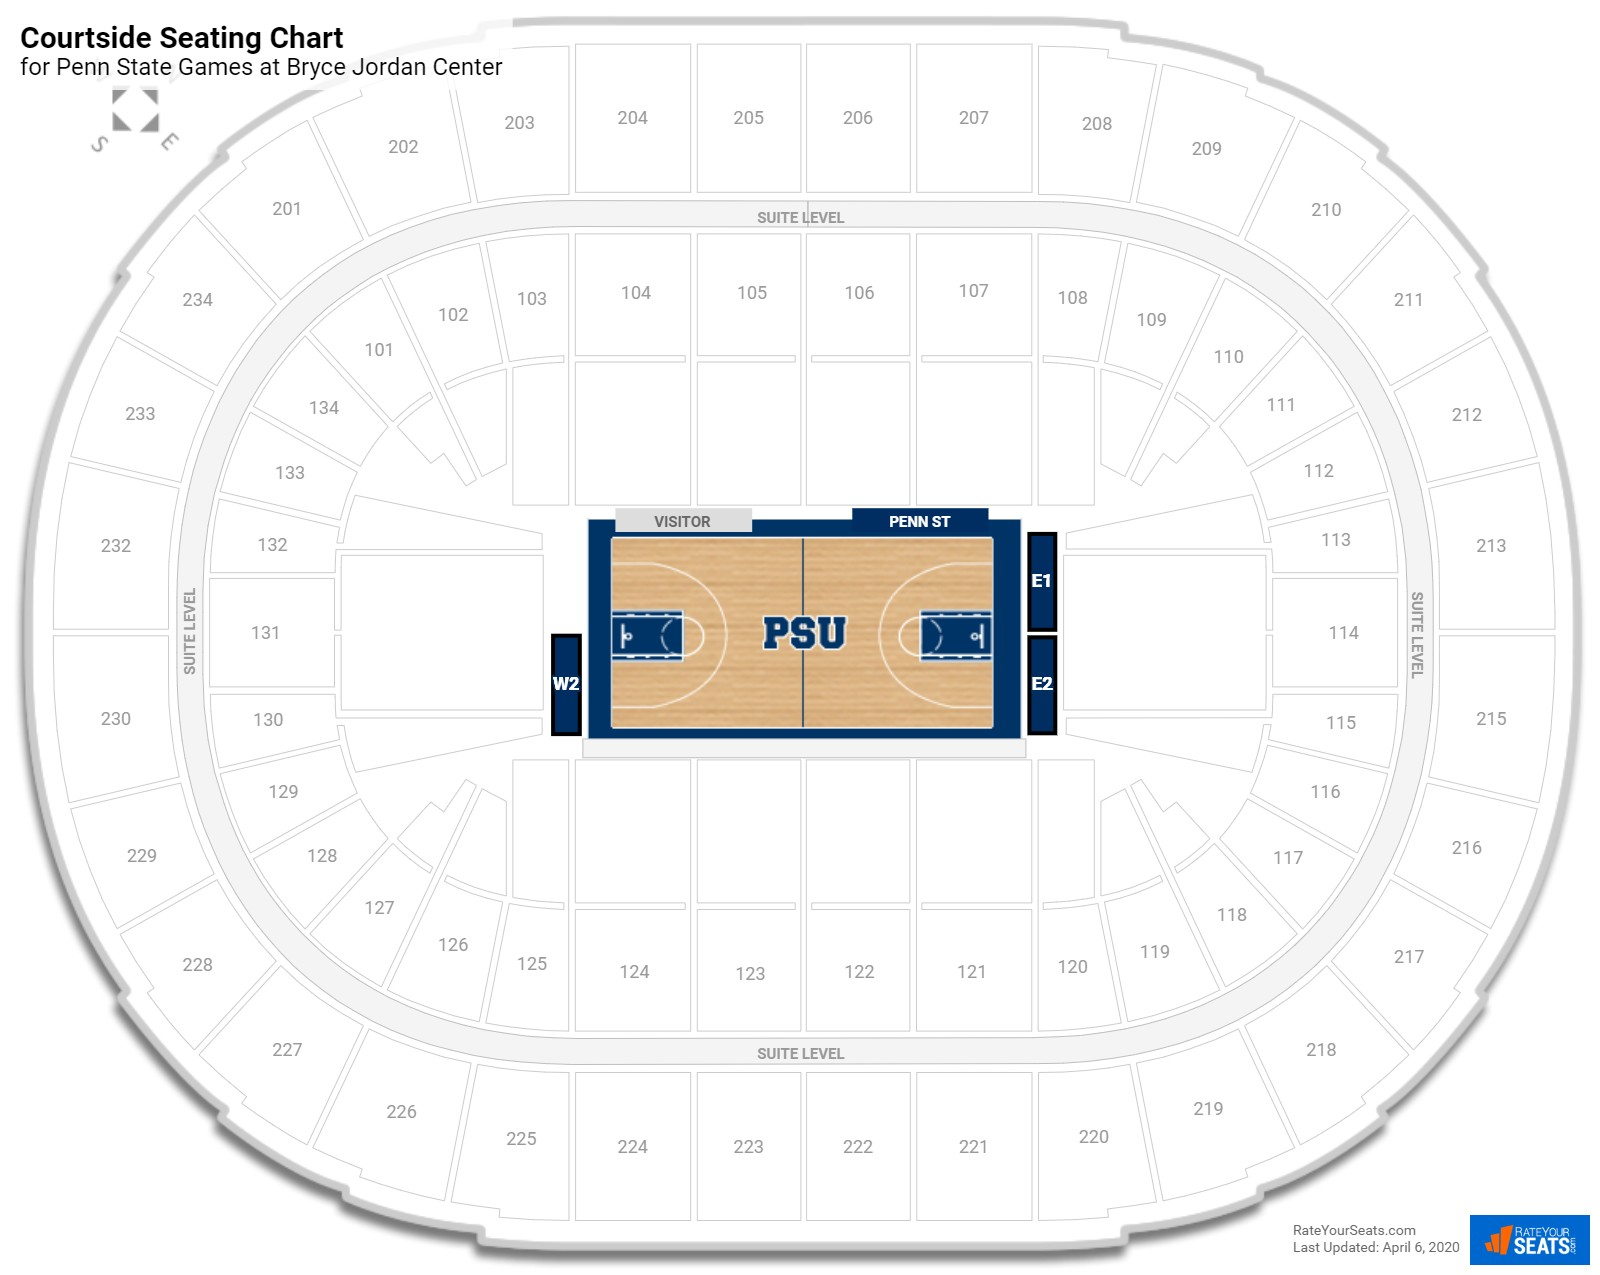 Bryce Jordan Center Courtside Seating Chart